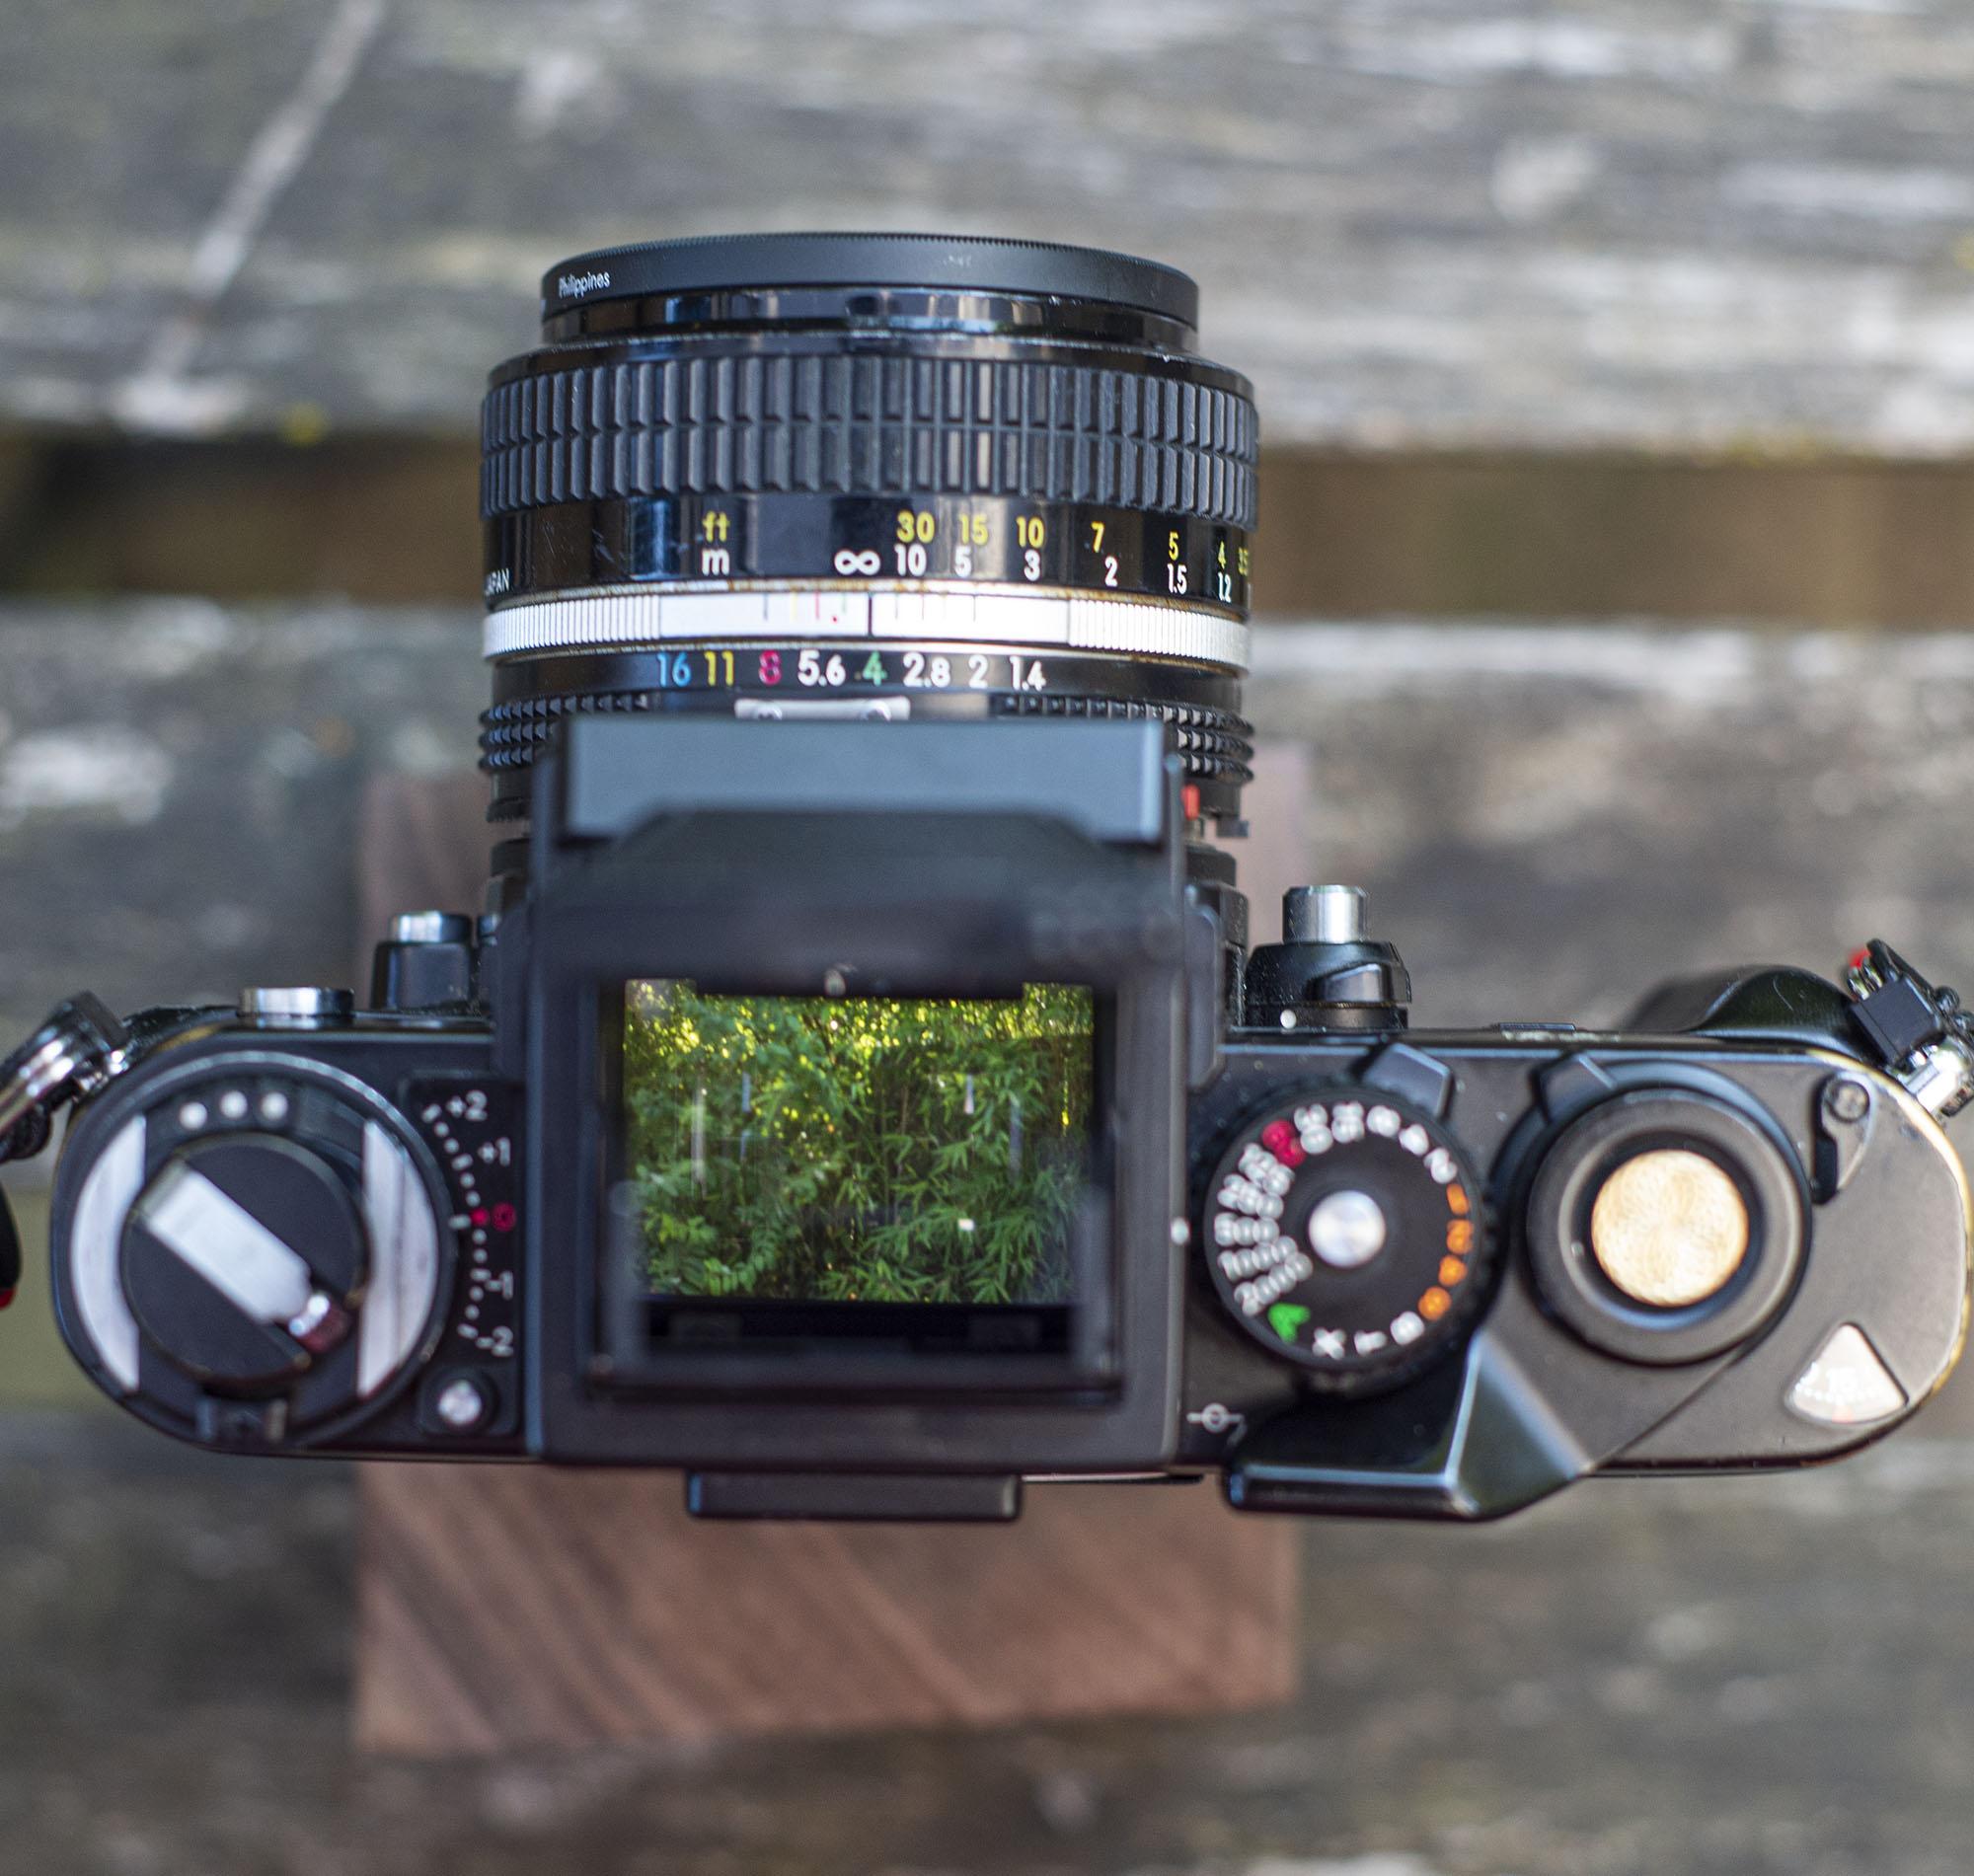 View through the waist level finder on a Nikon F3